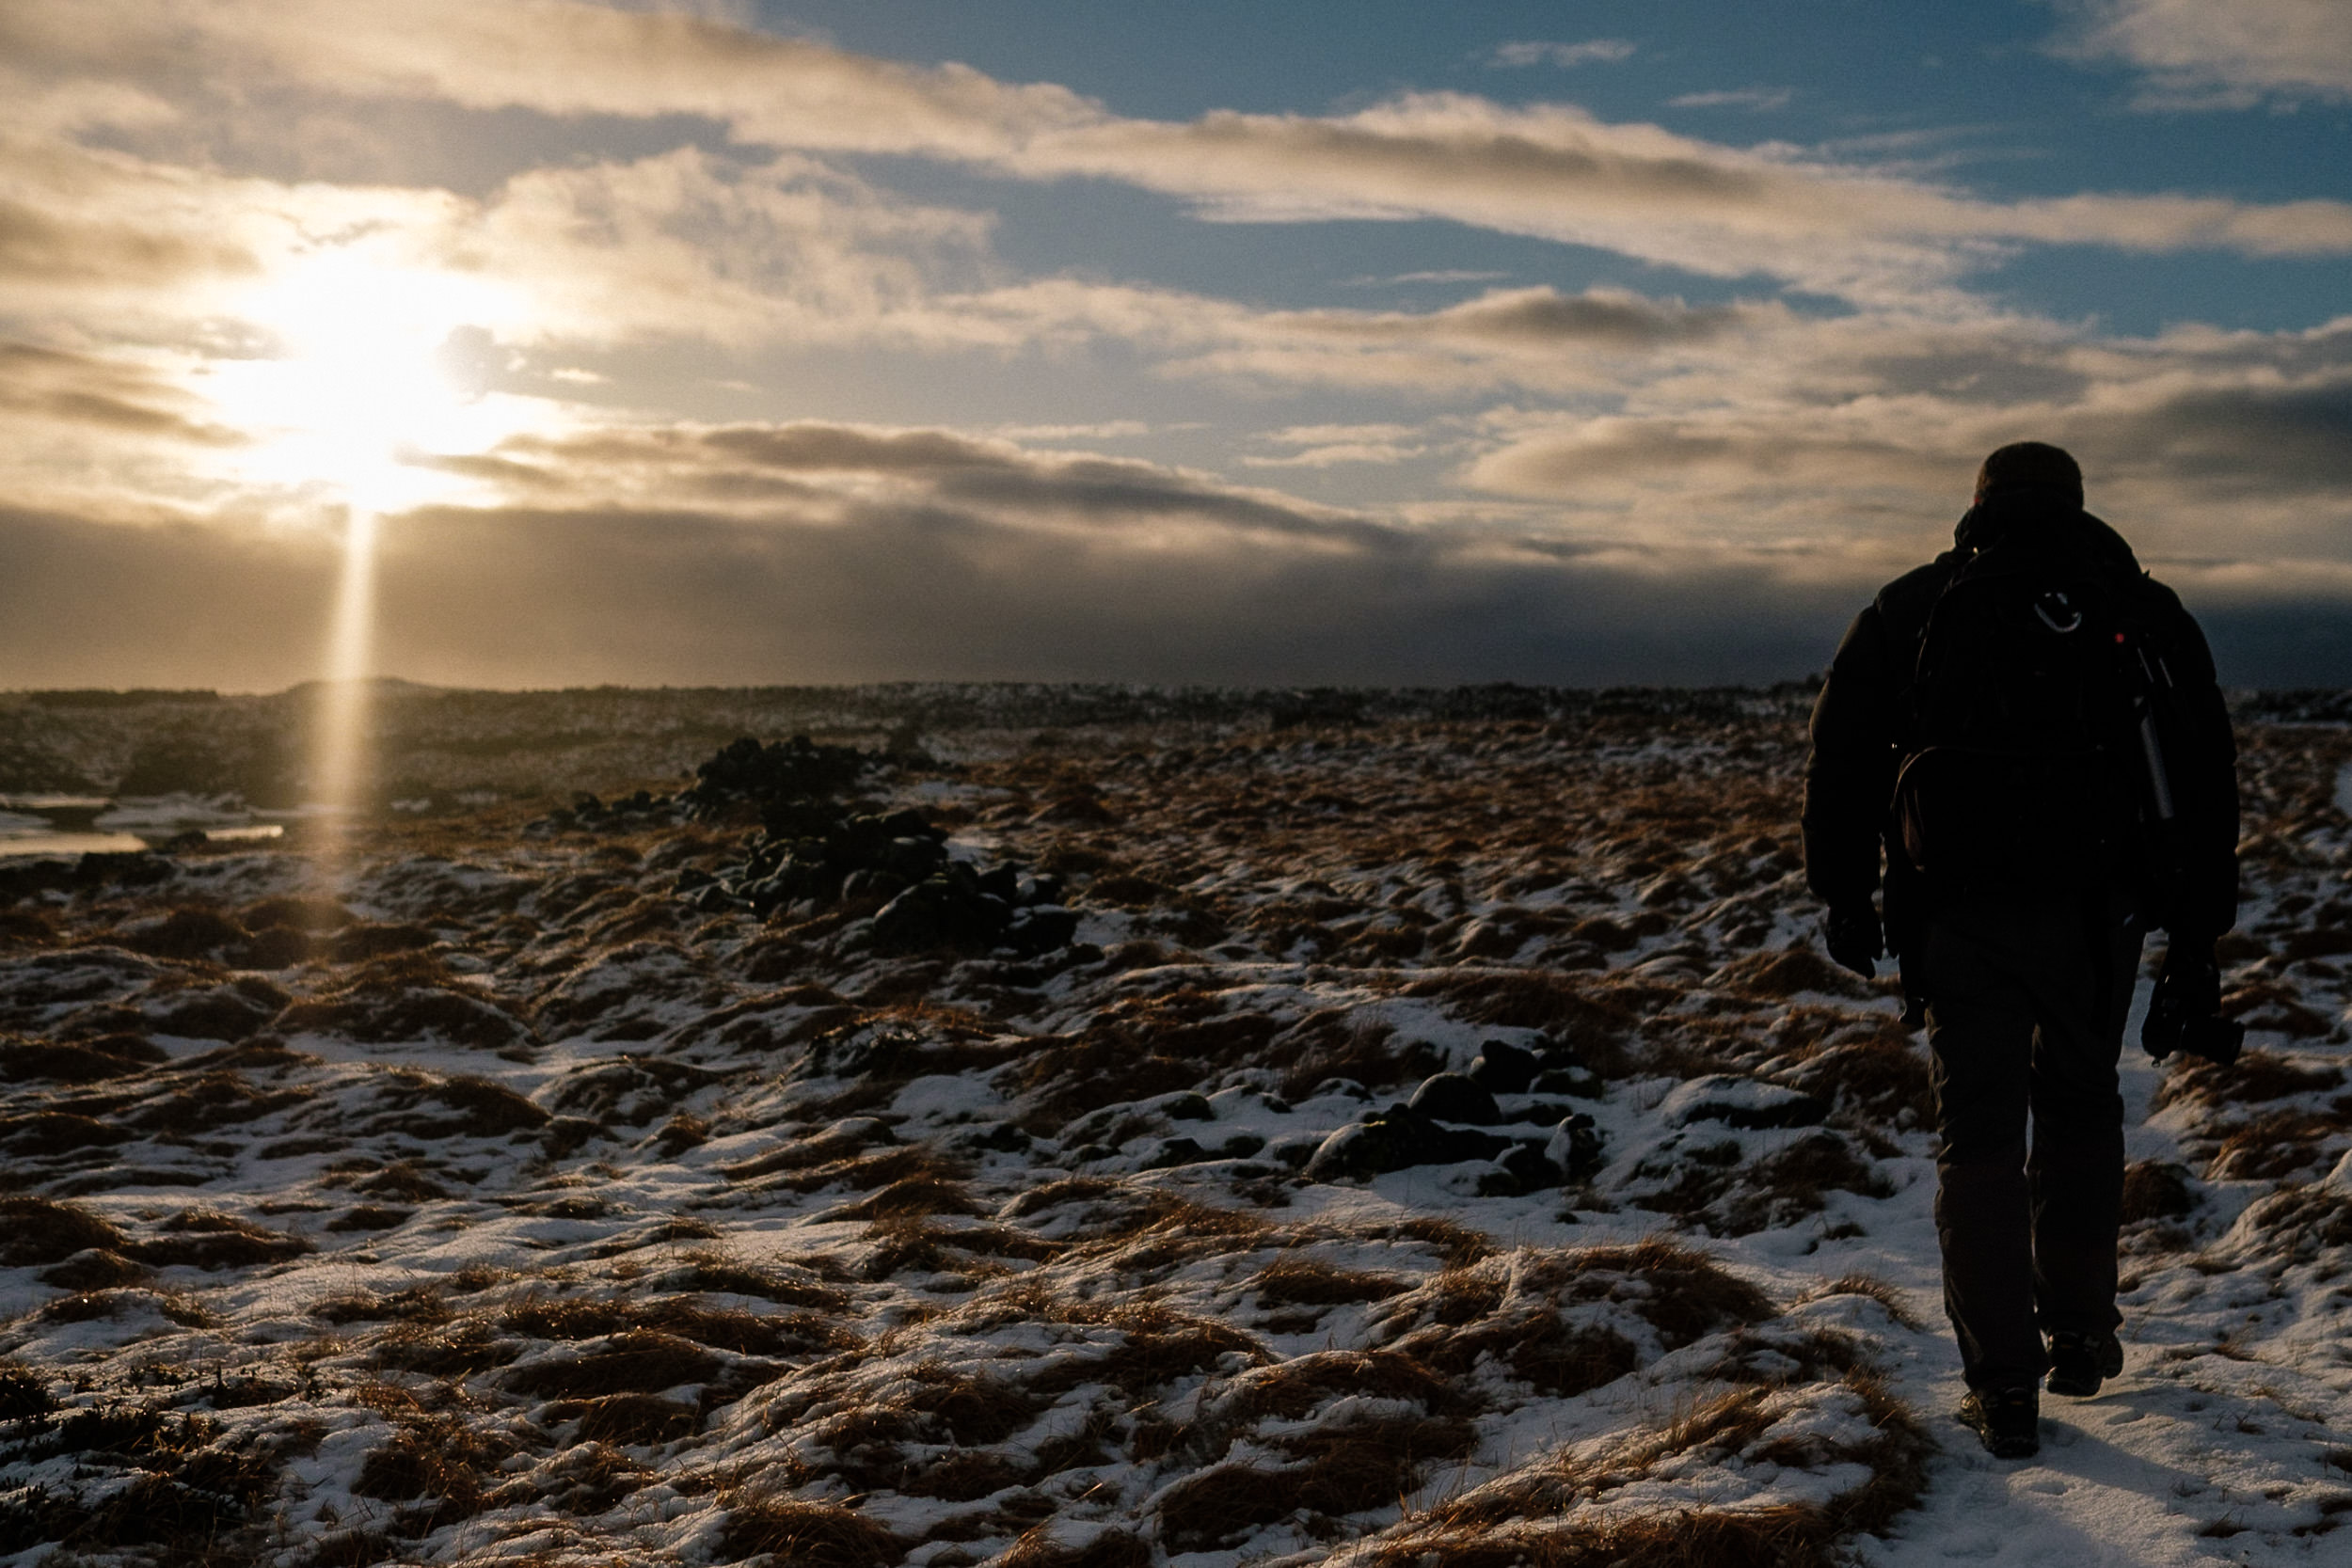 Collective_Wander_Iceland_Photographers_Trip_031.jpg